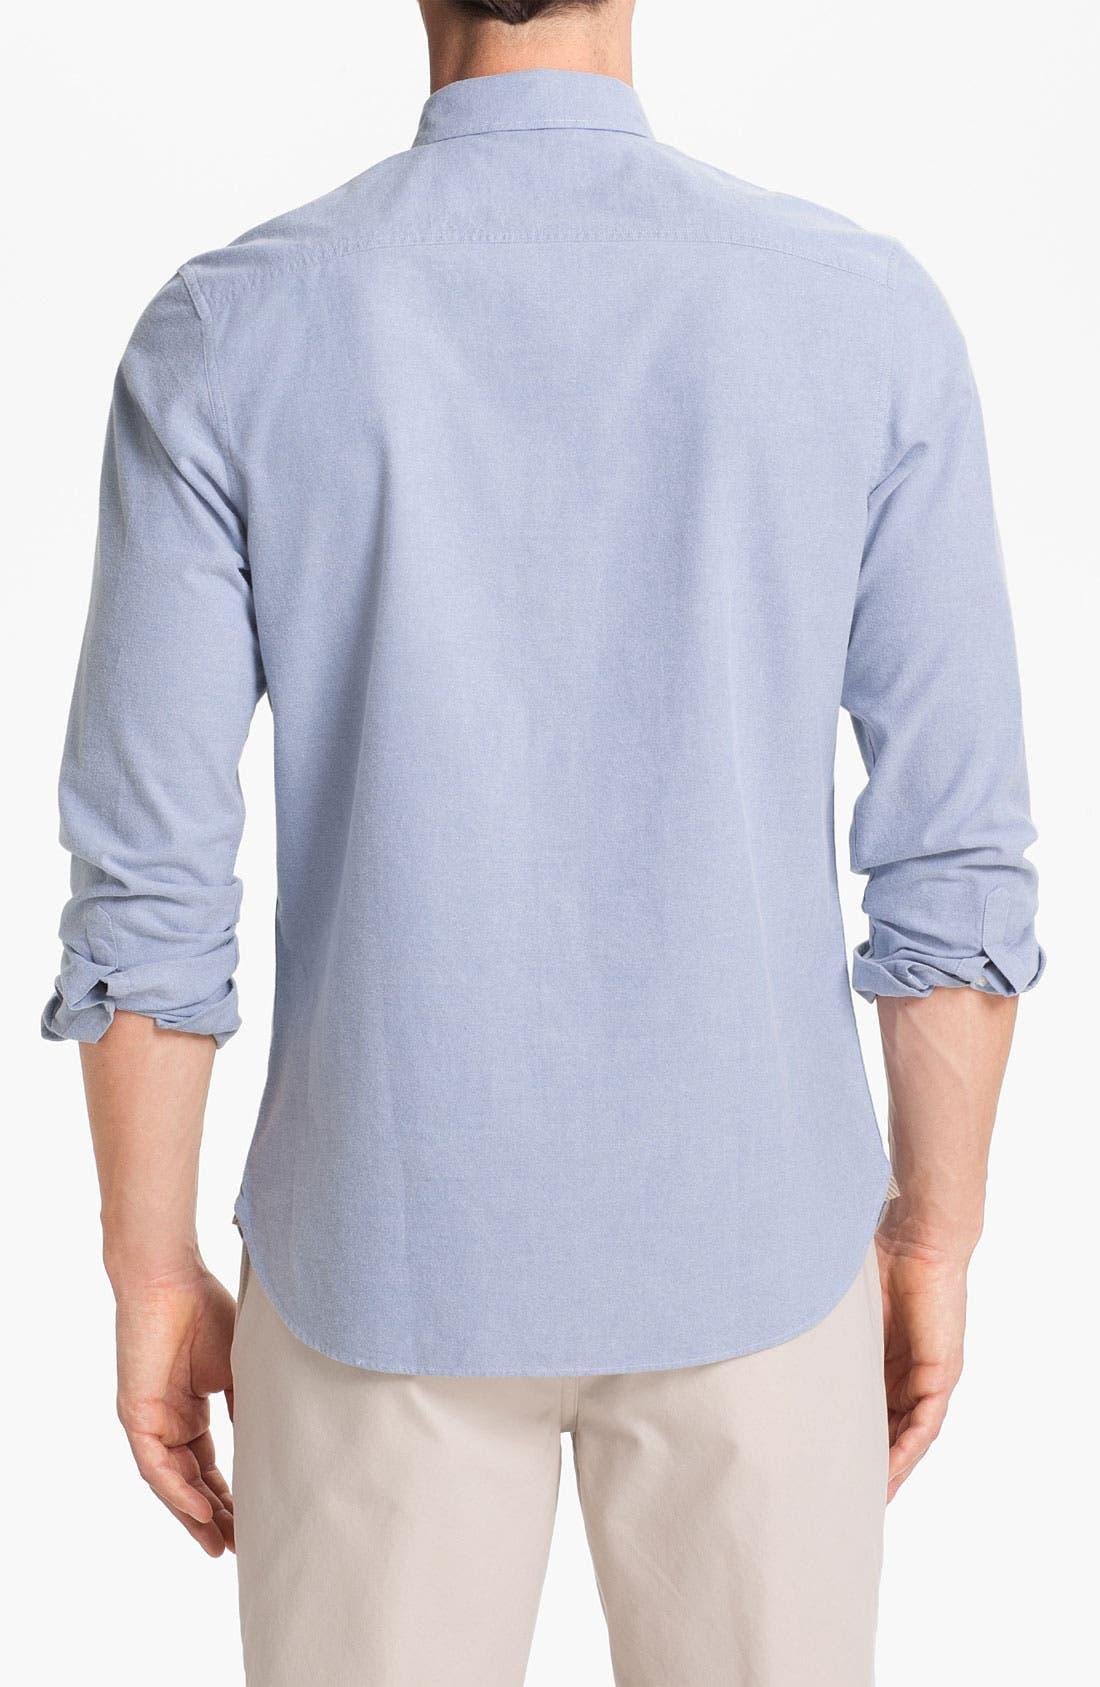 Alternate Image 2  - Wallin & Bros. Trim Fit Oxford Sport Shirt